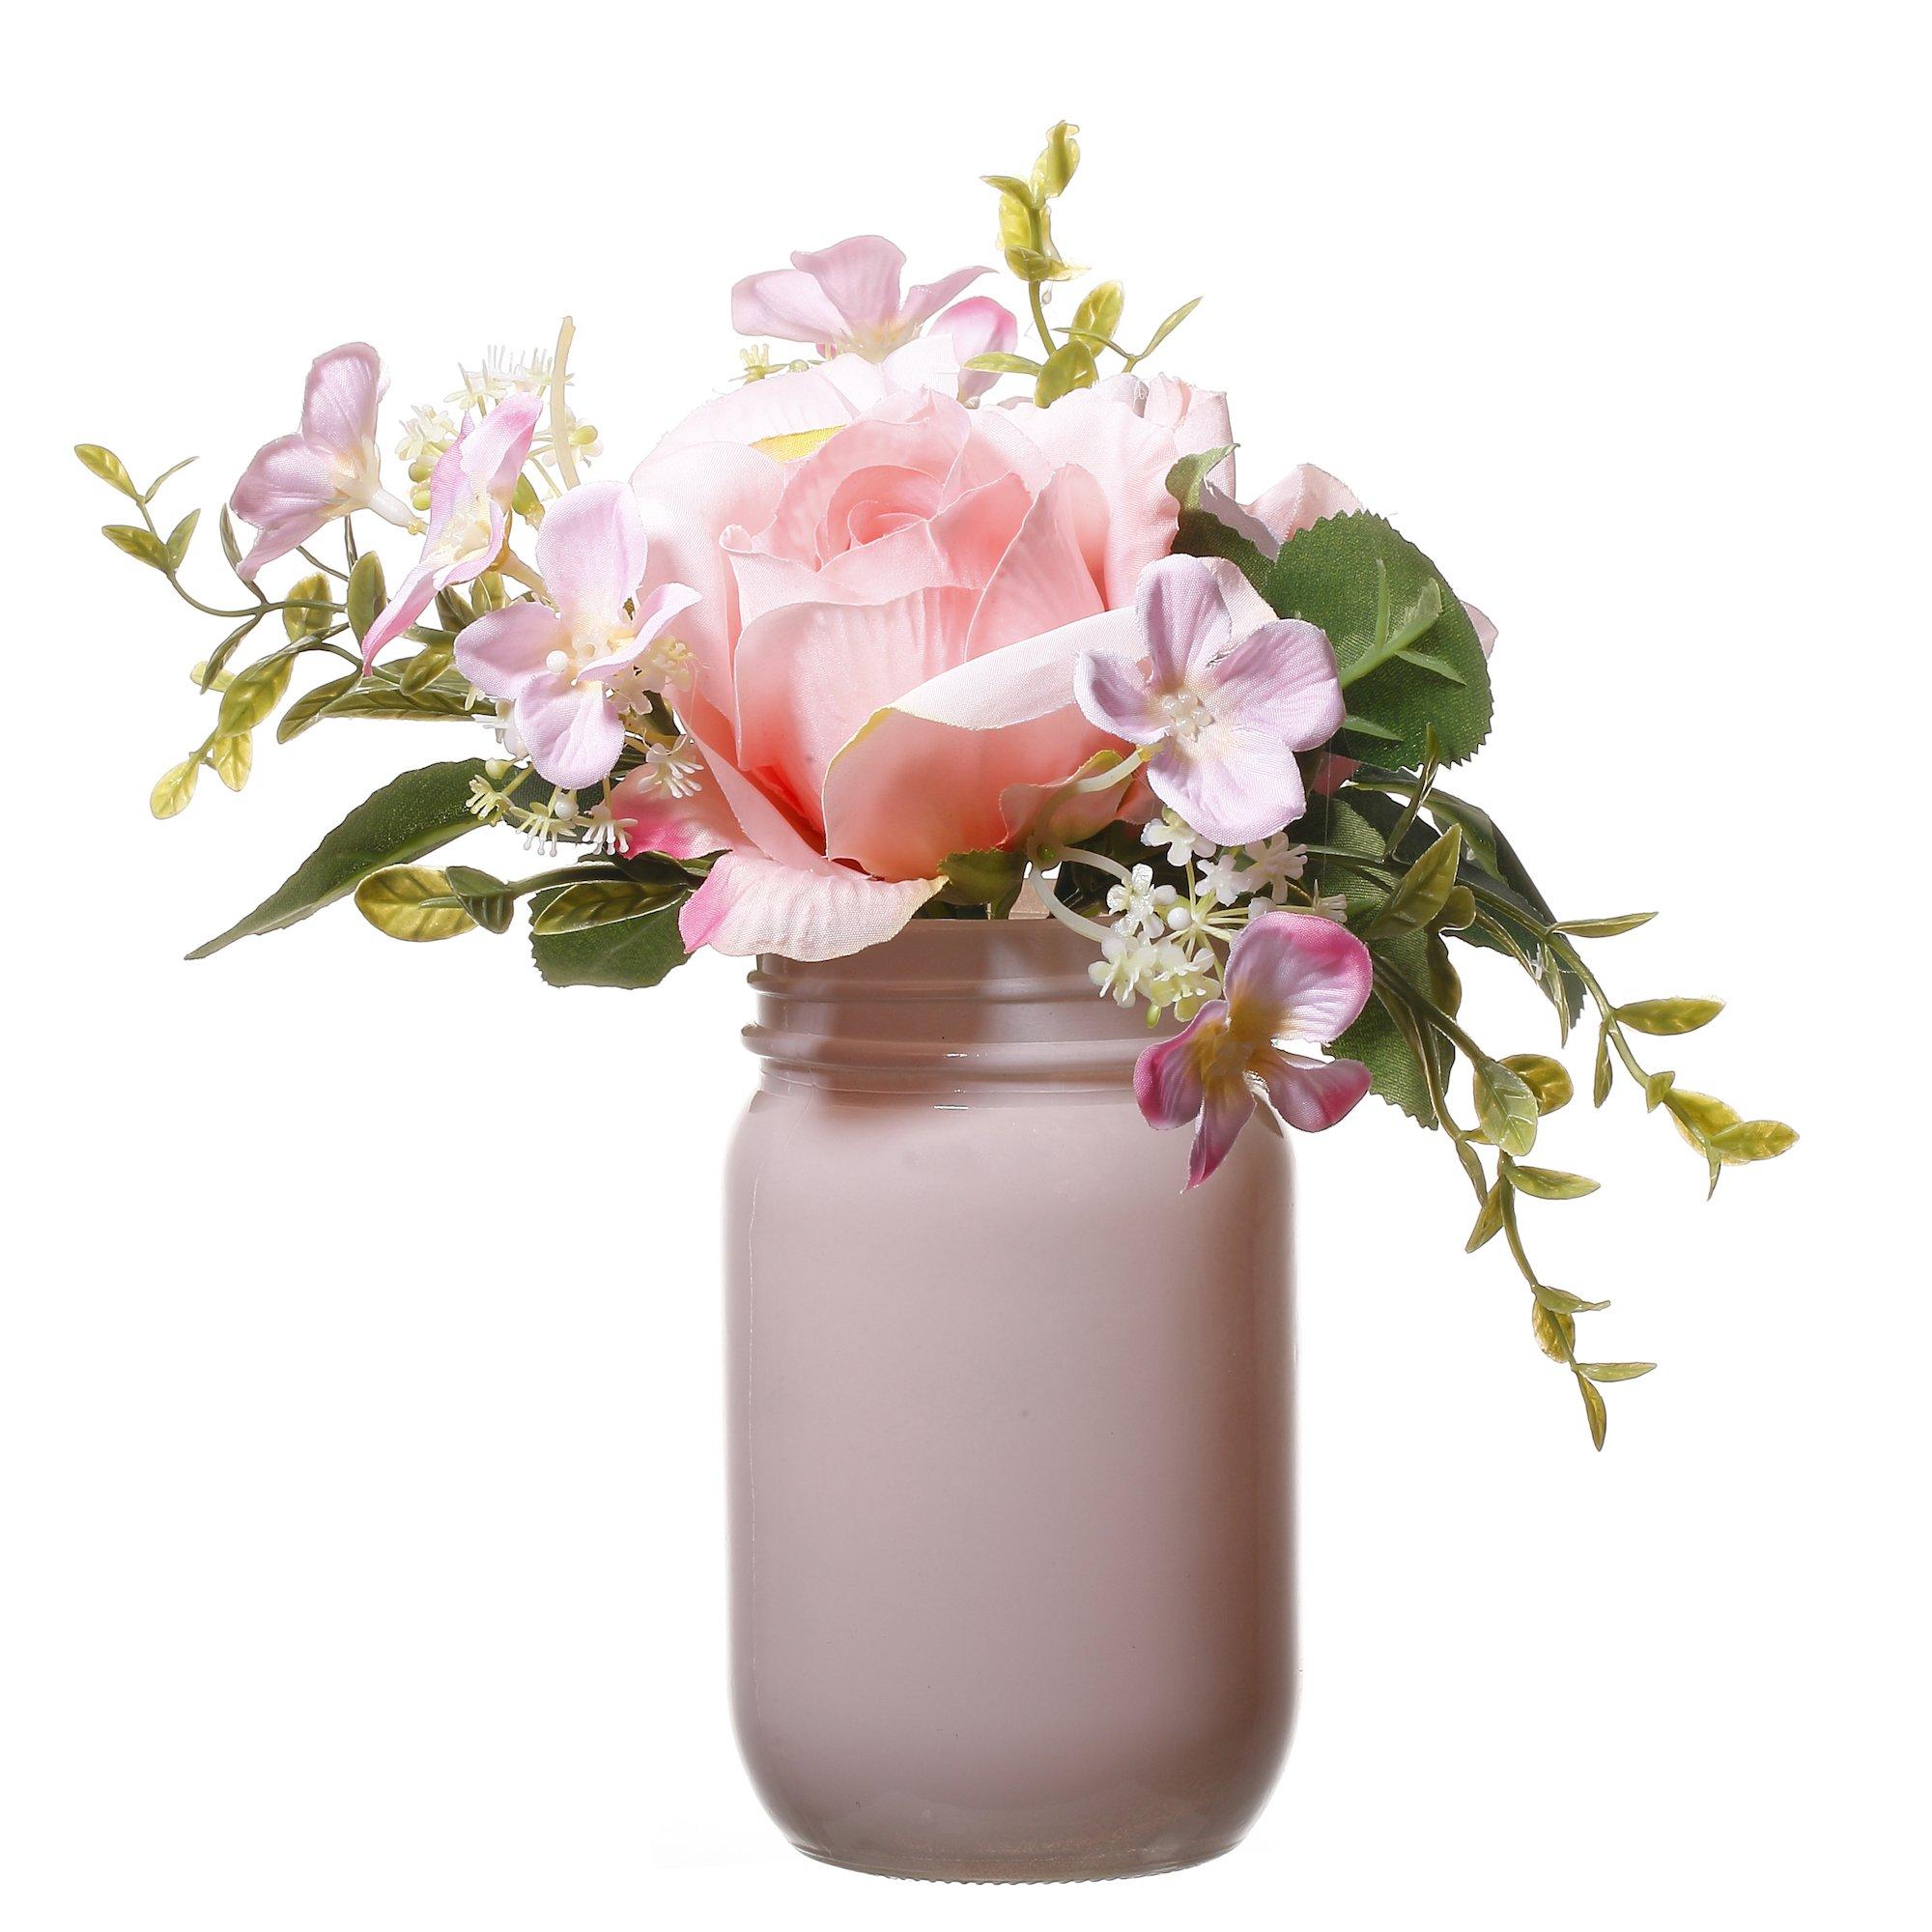 V more pink glass mason jar flower vase artificial silk flowers v more pink glass mason jar flower vase artificial silk flowers bouquet in acrylic faux water mightylinksfo